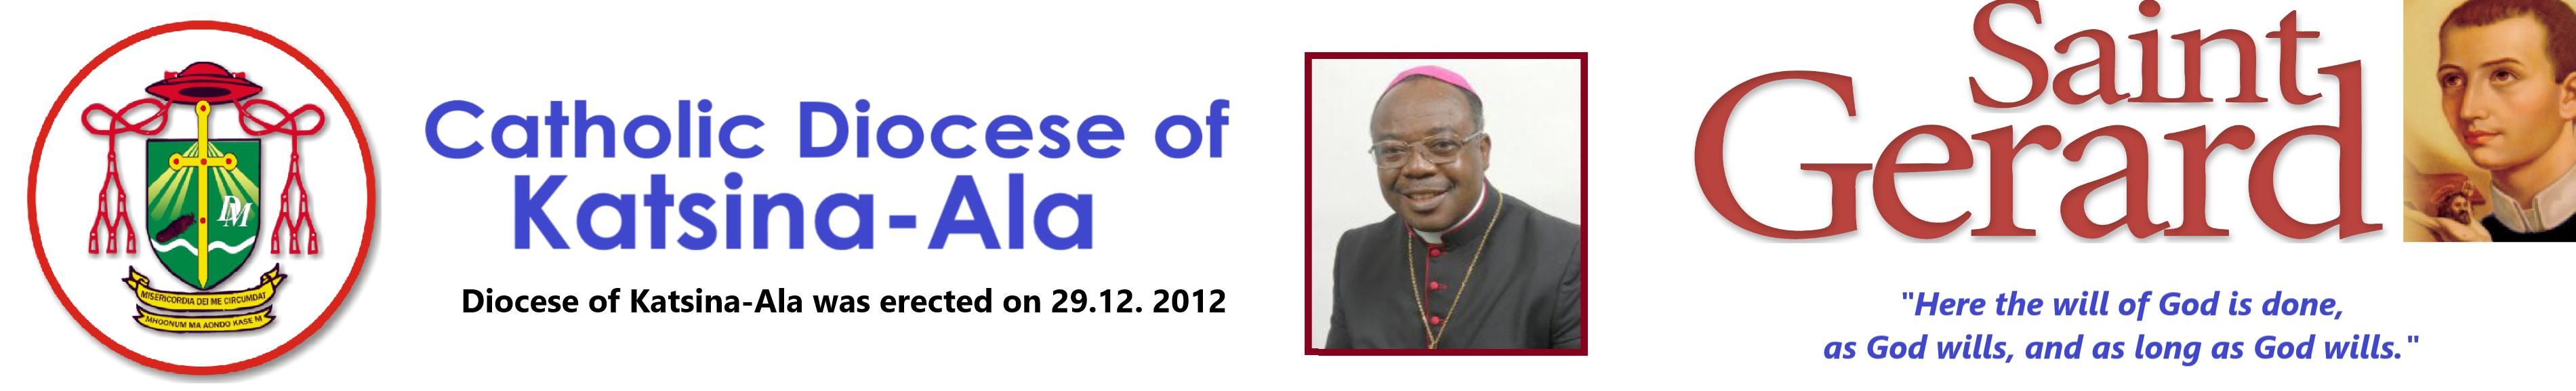 Diocese of Katsina-Ala